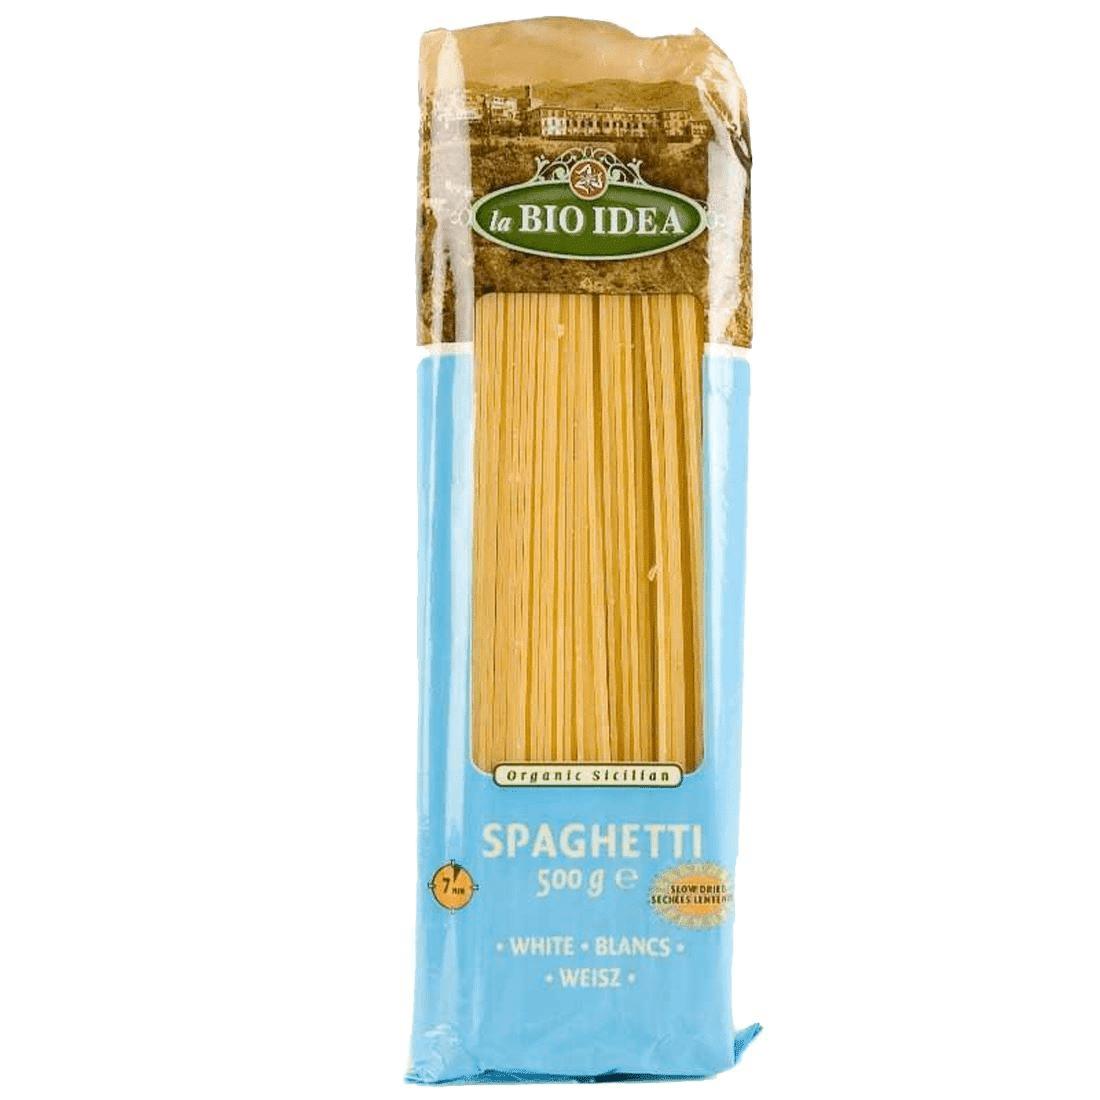 Les Délices De Sarah Pâte spaghetti blanche 500g--la bio idea